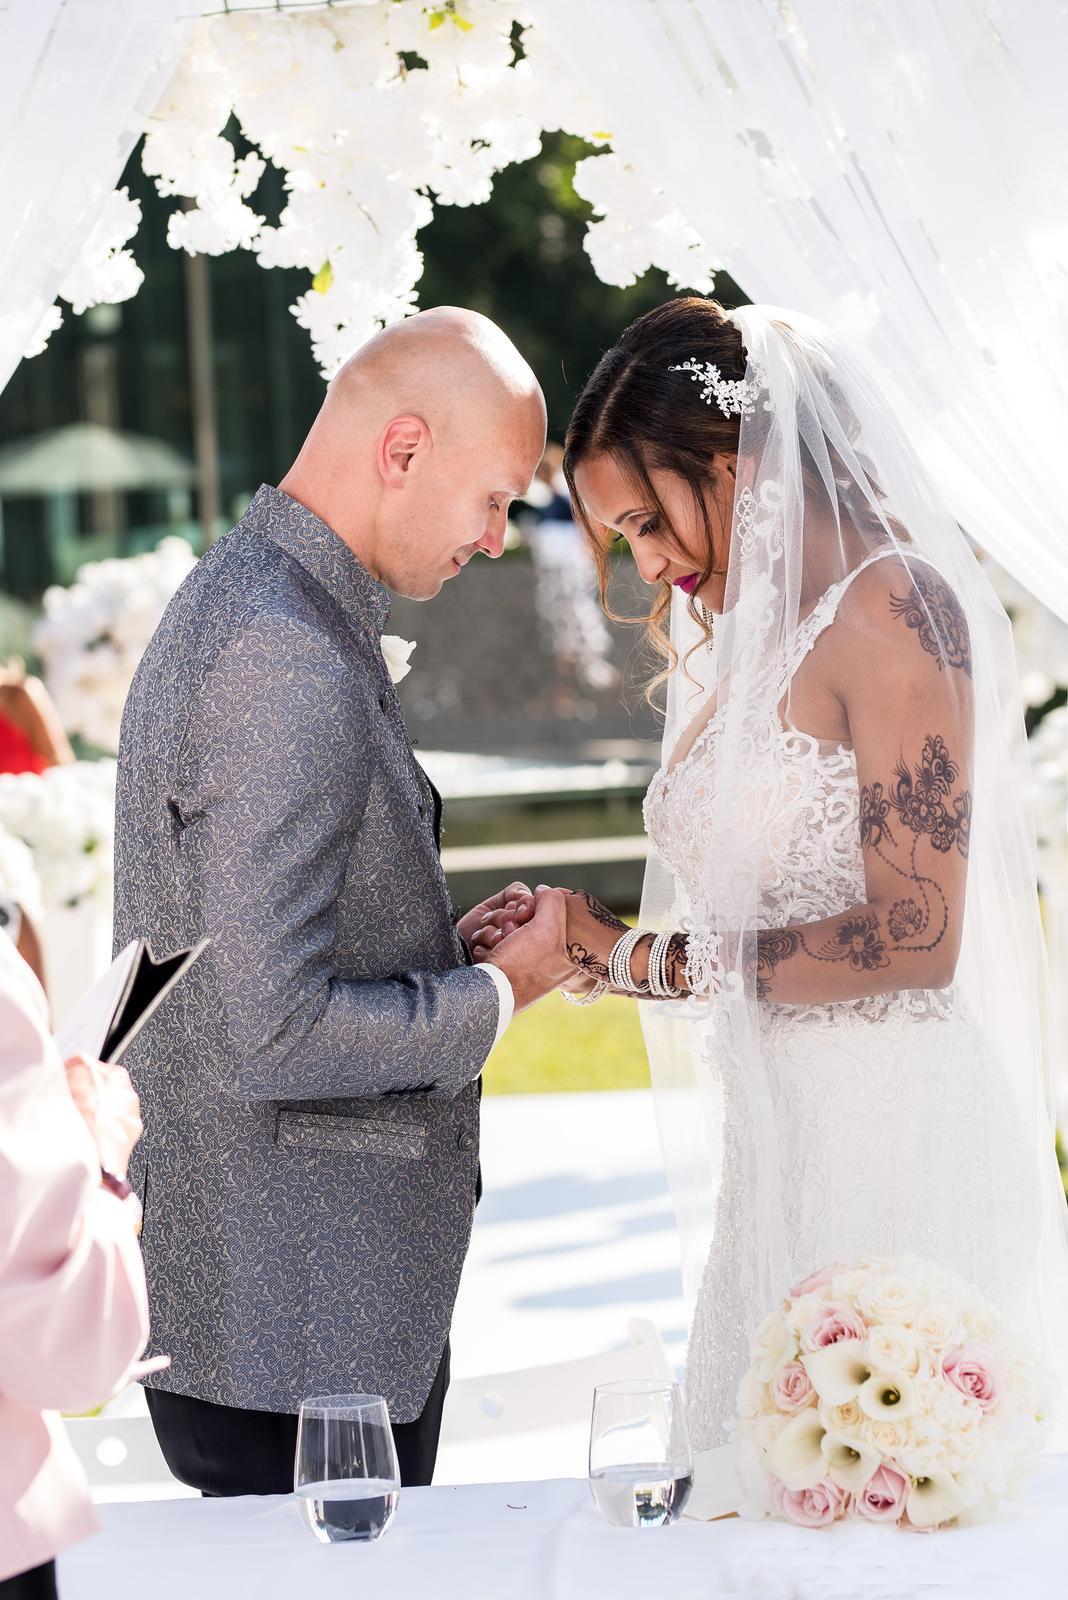 Svadba Zahra a Milan - Obrázok č. 38